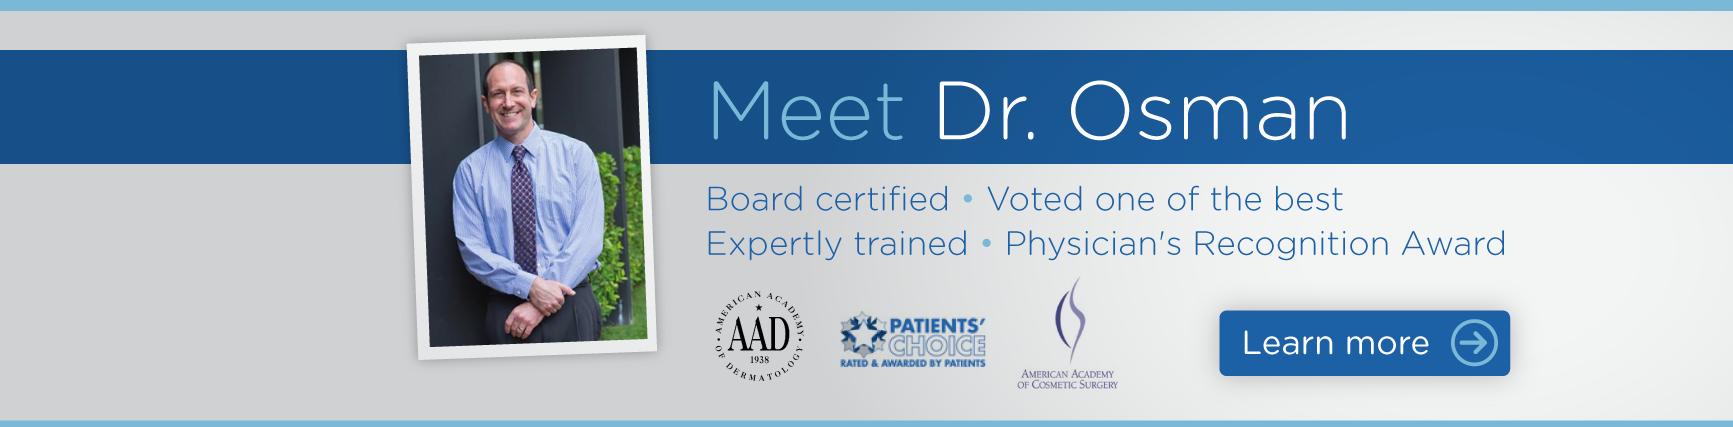 Meet Dr. Osman - Dermatologist in Calabasas and Northridge